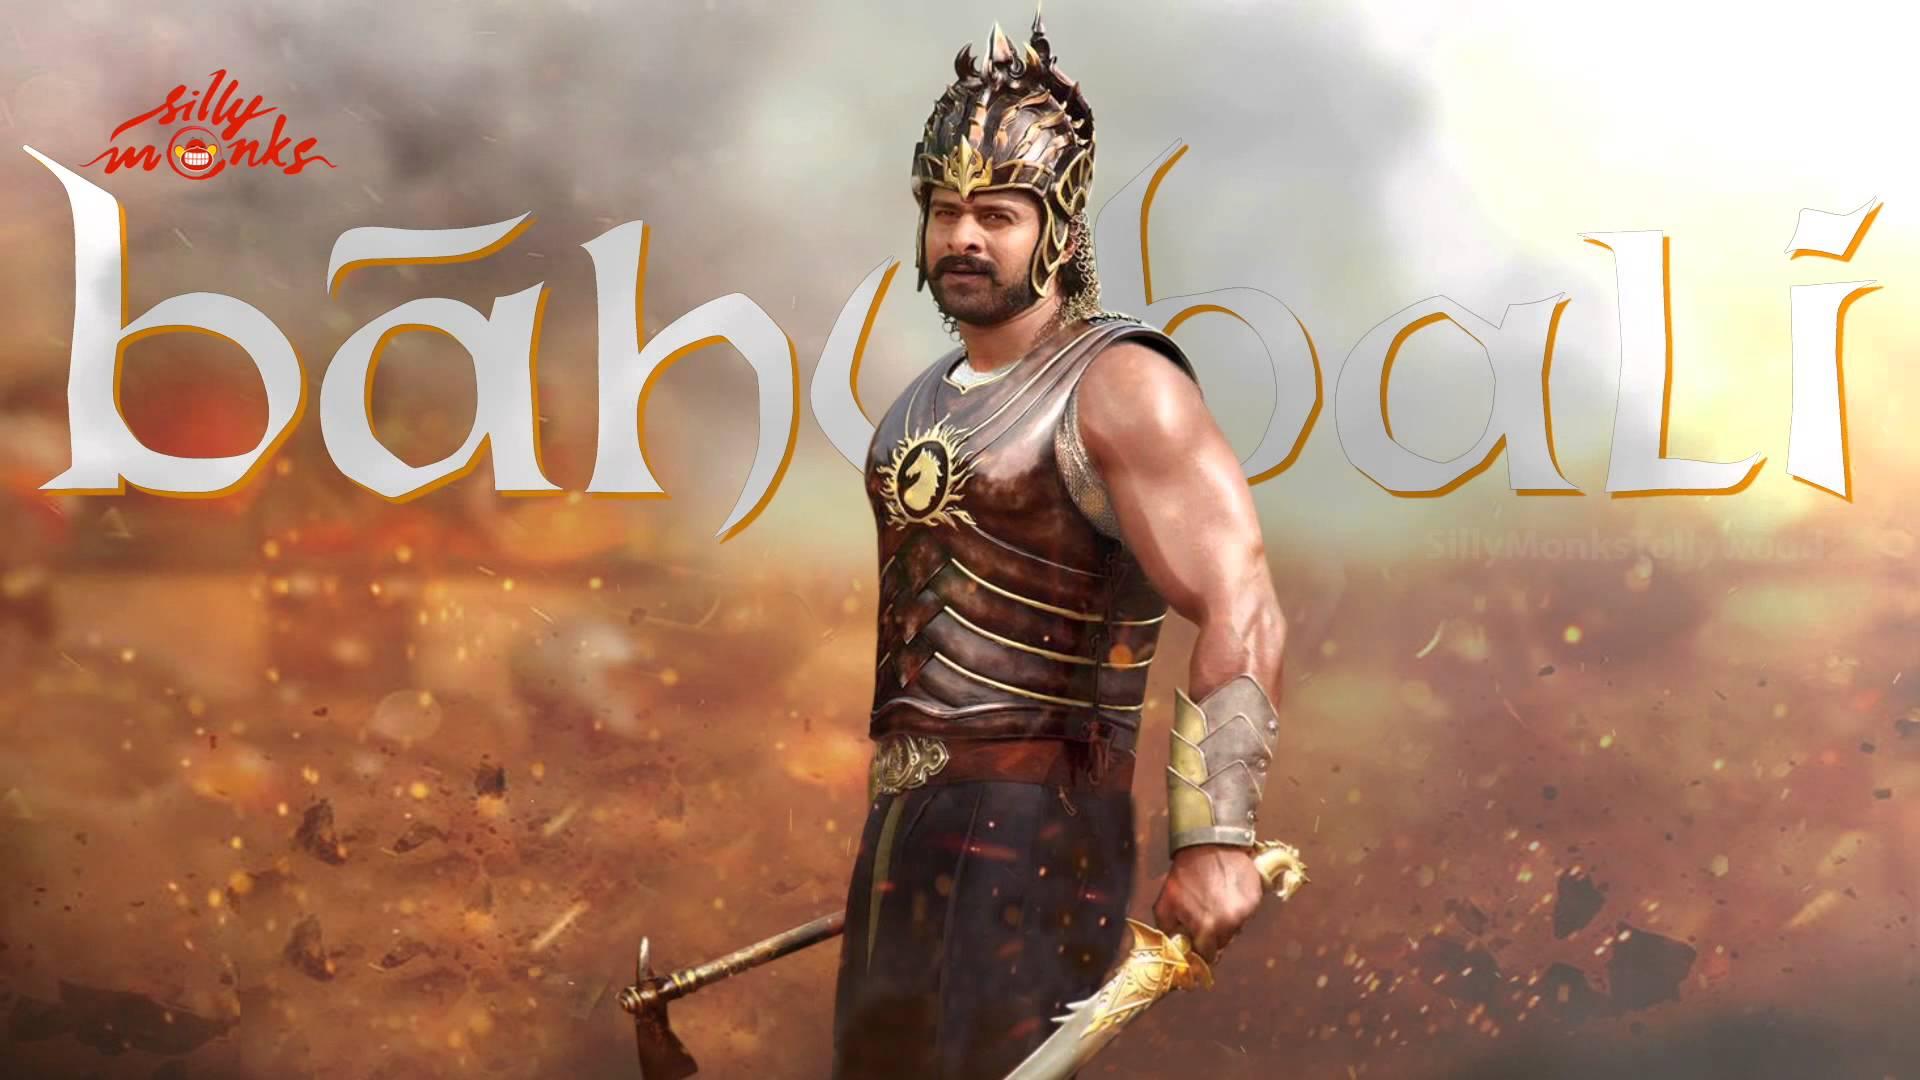 Baahubali hindi songs mp4 hd free download